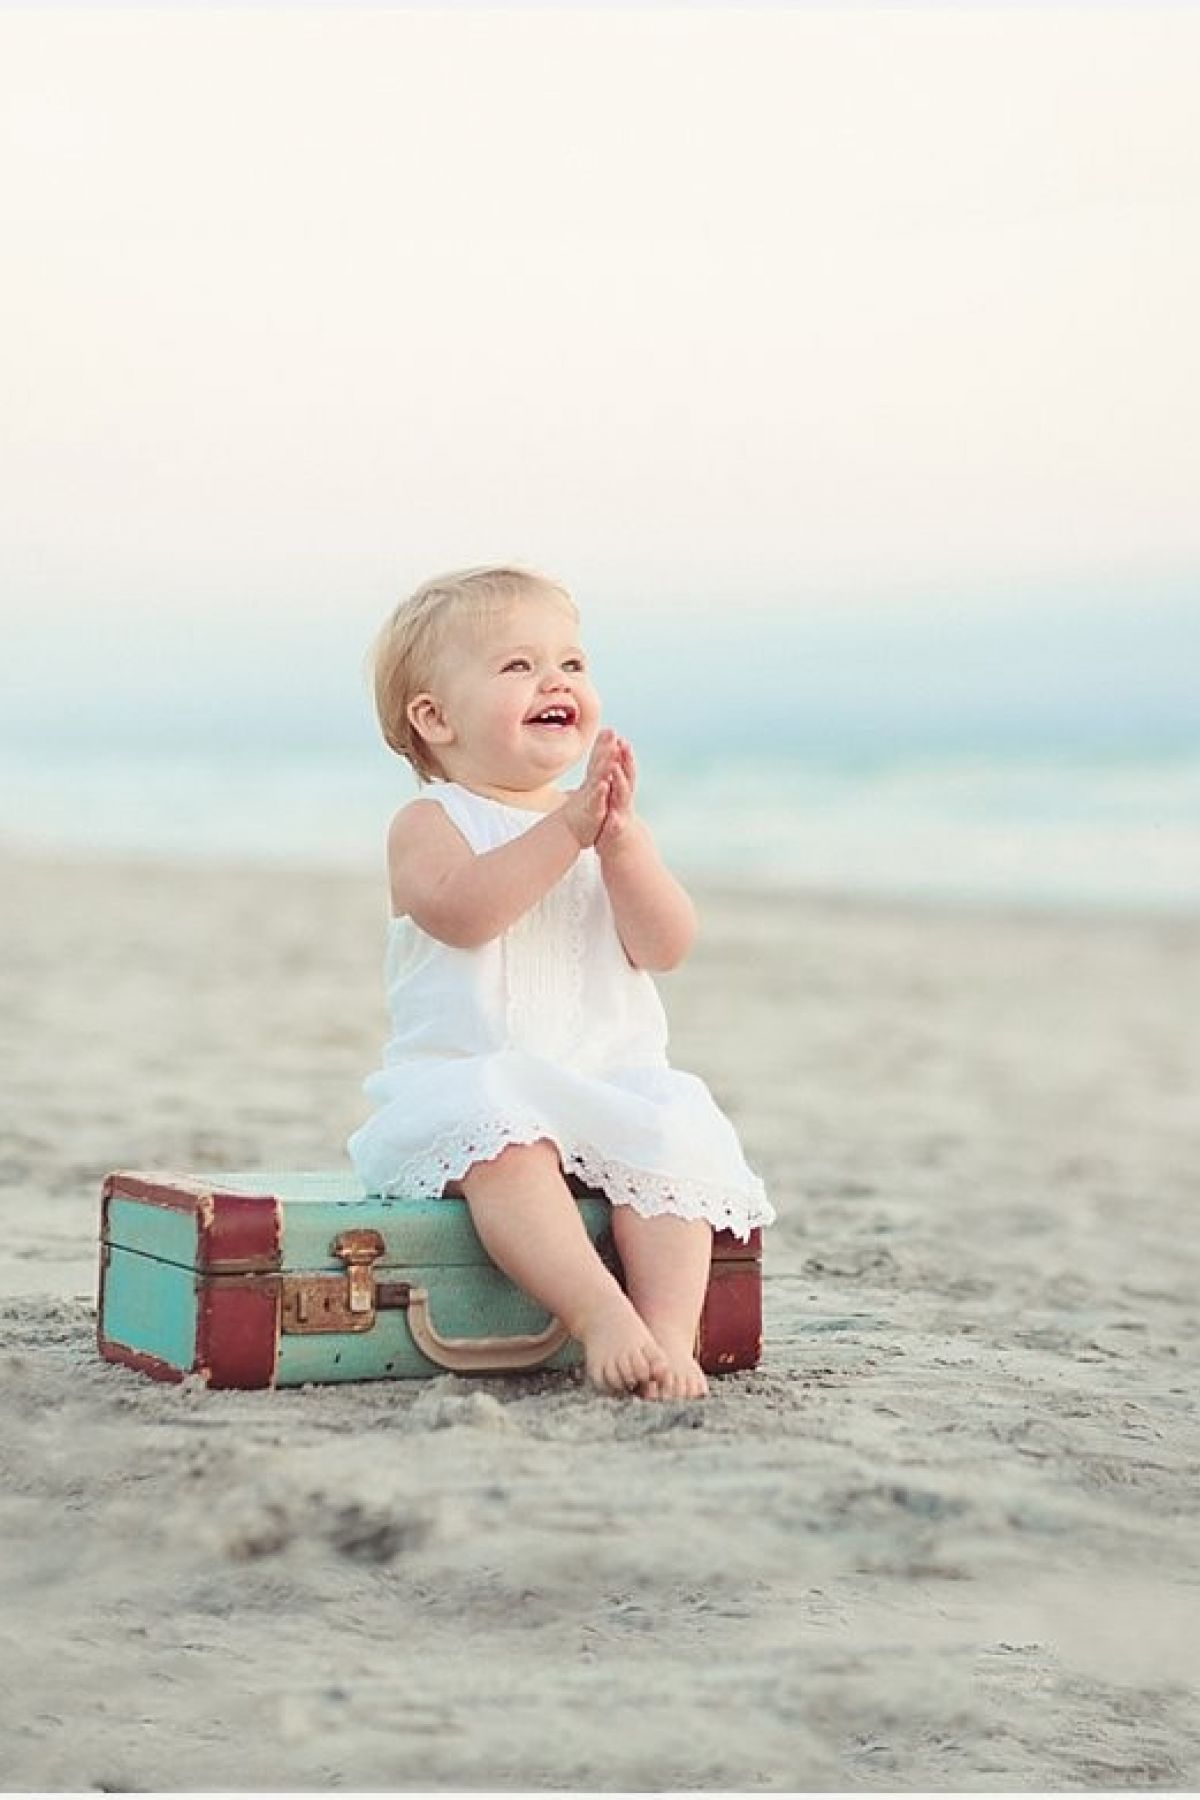 Dopustite detetu da hoda boso na plaži